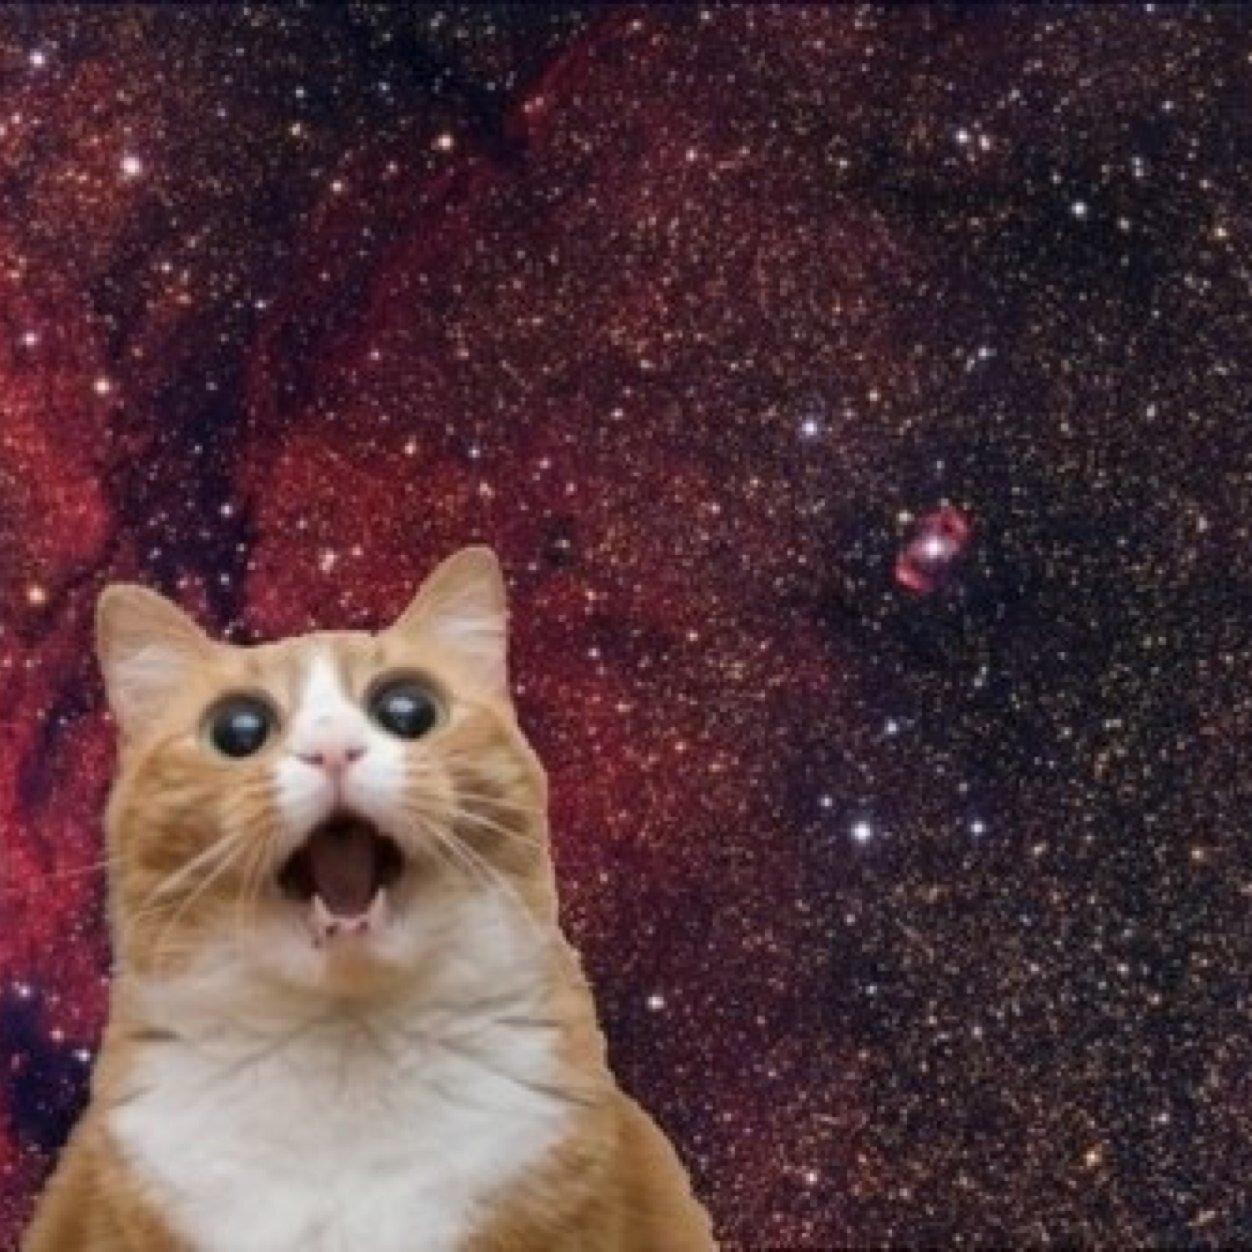 cat space pics catspacepics